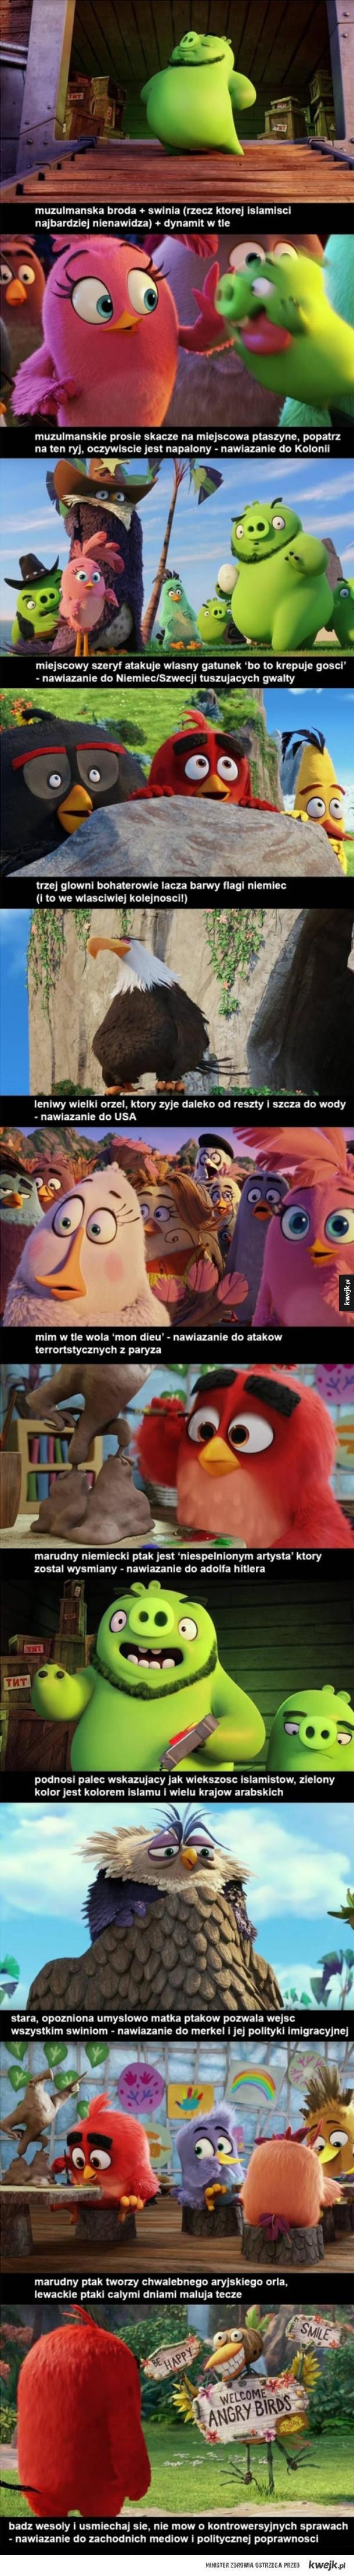 Film Angry Birds